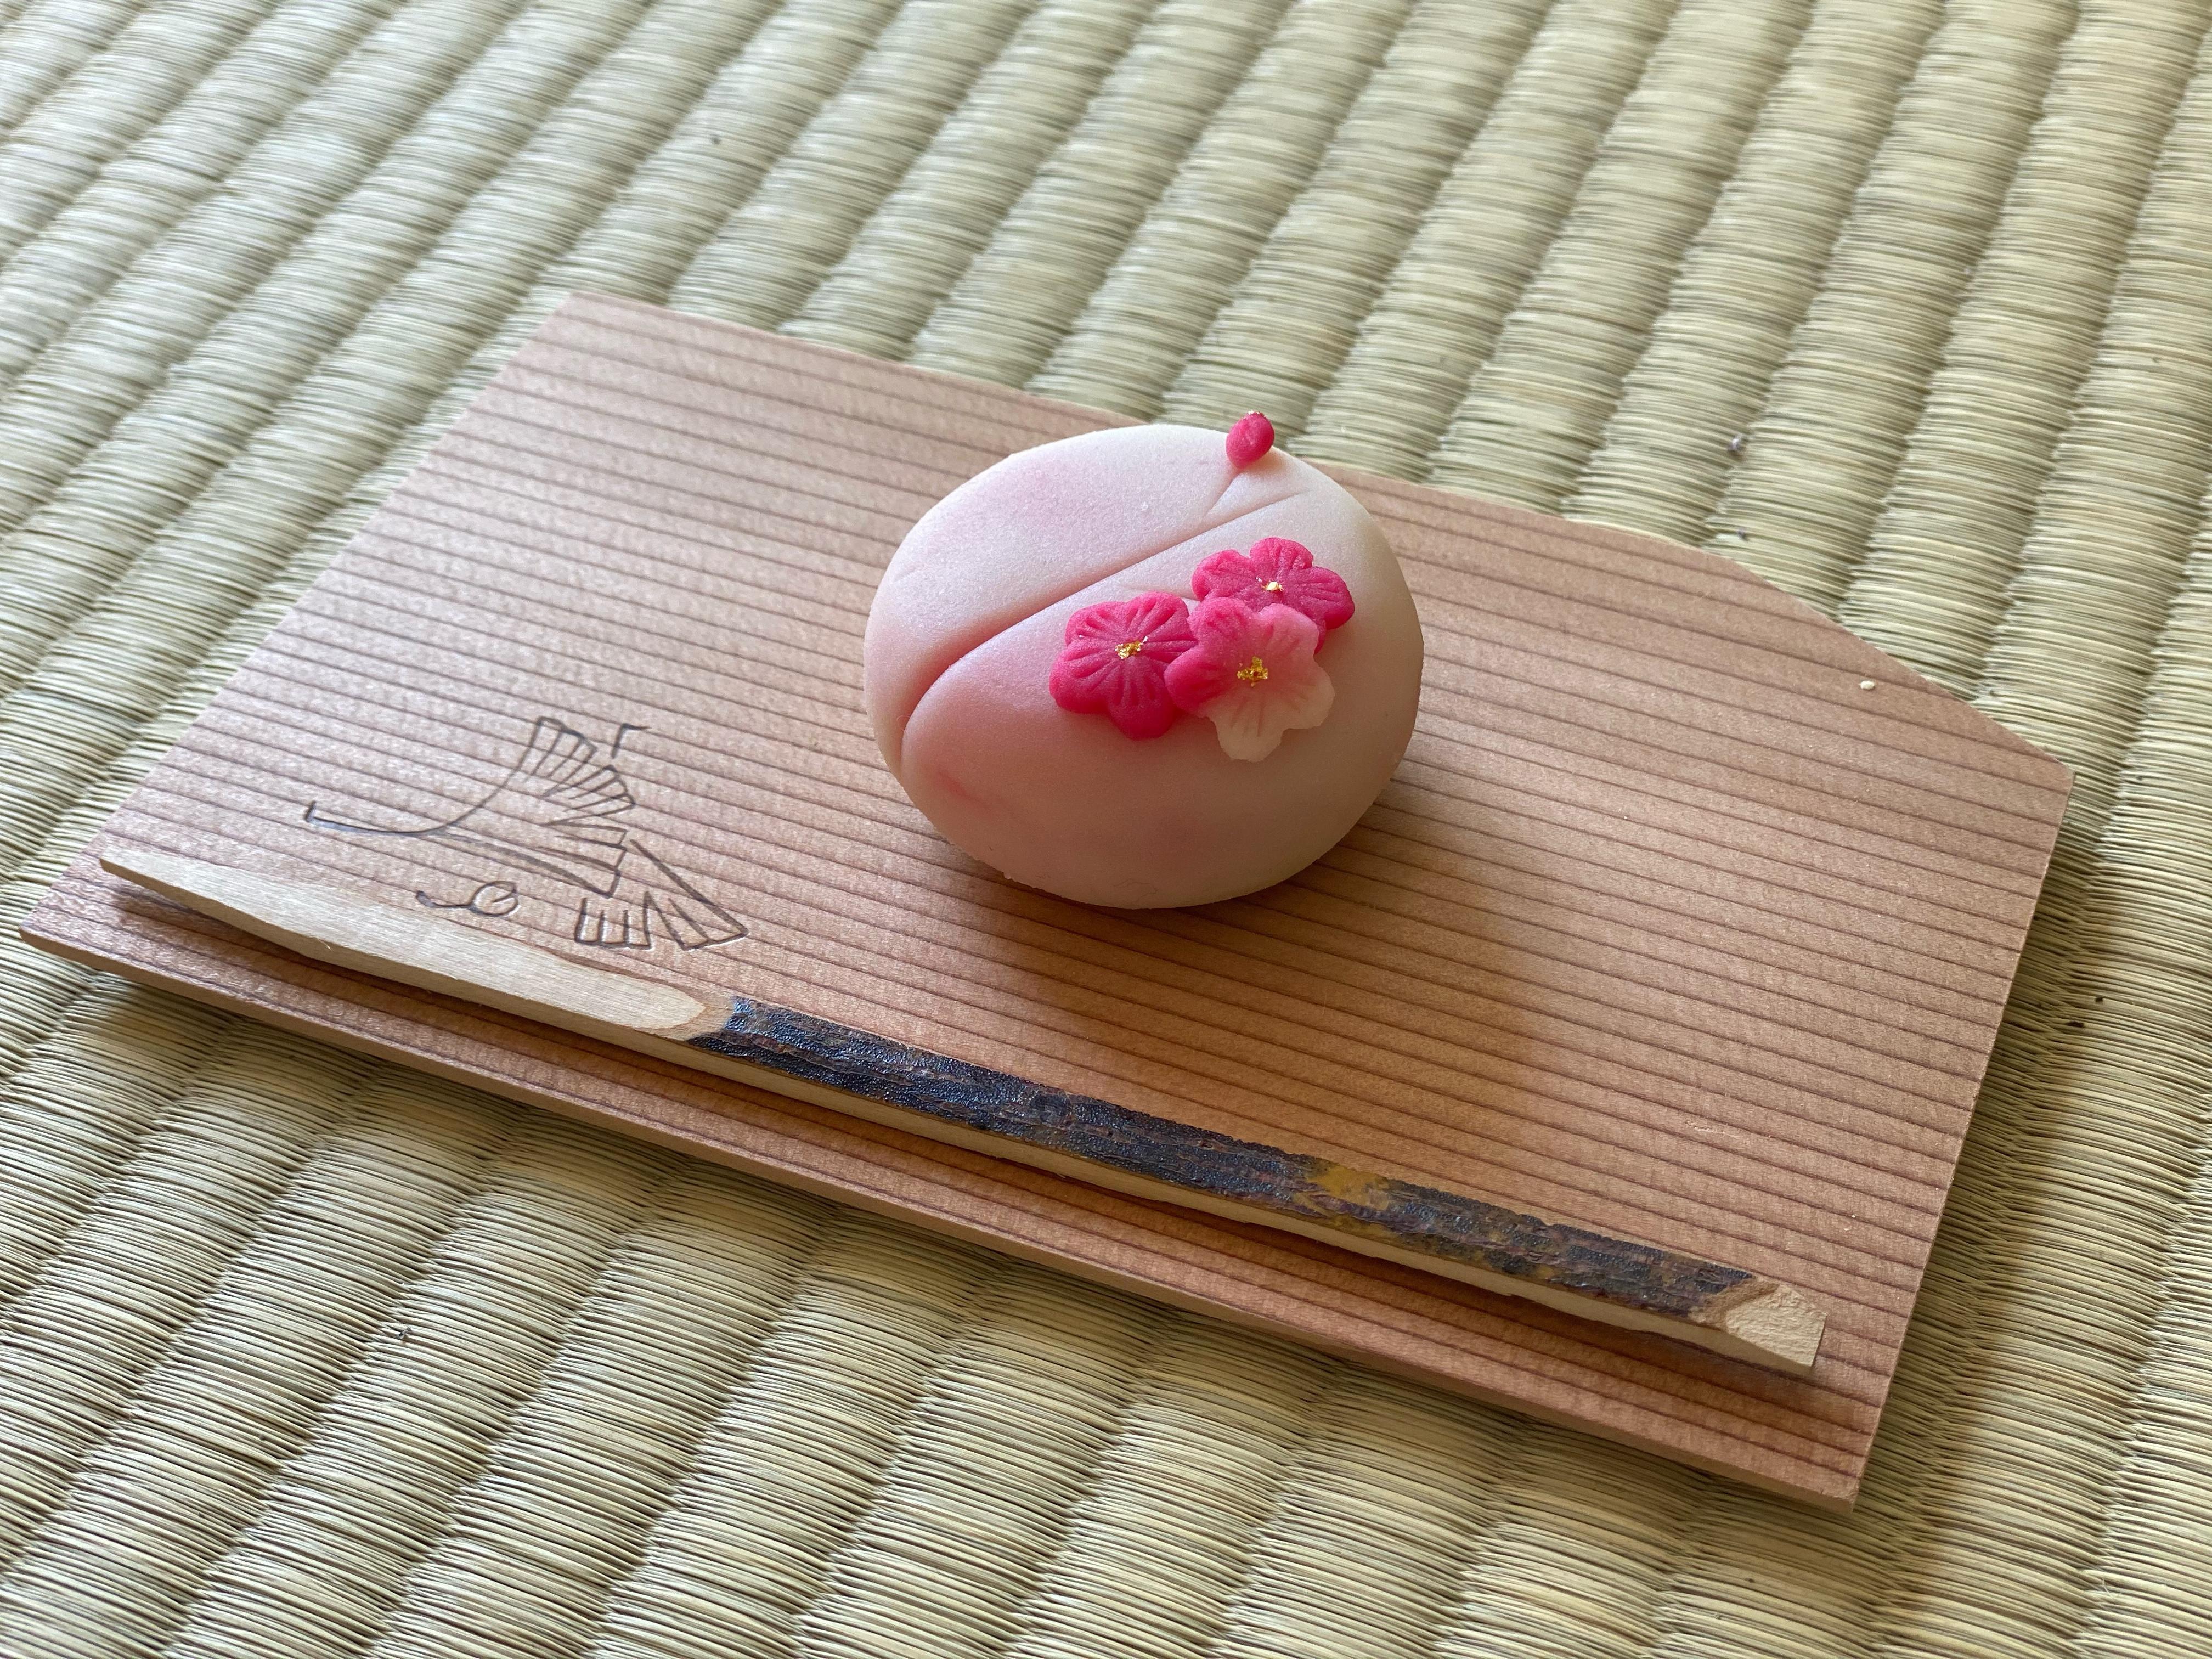 The Wagashi Workshop